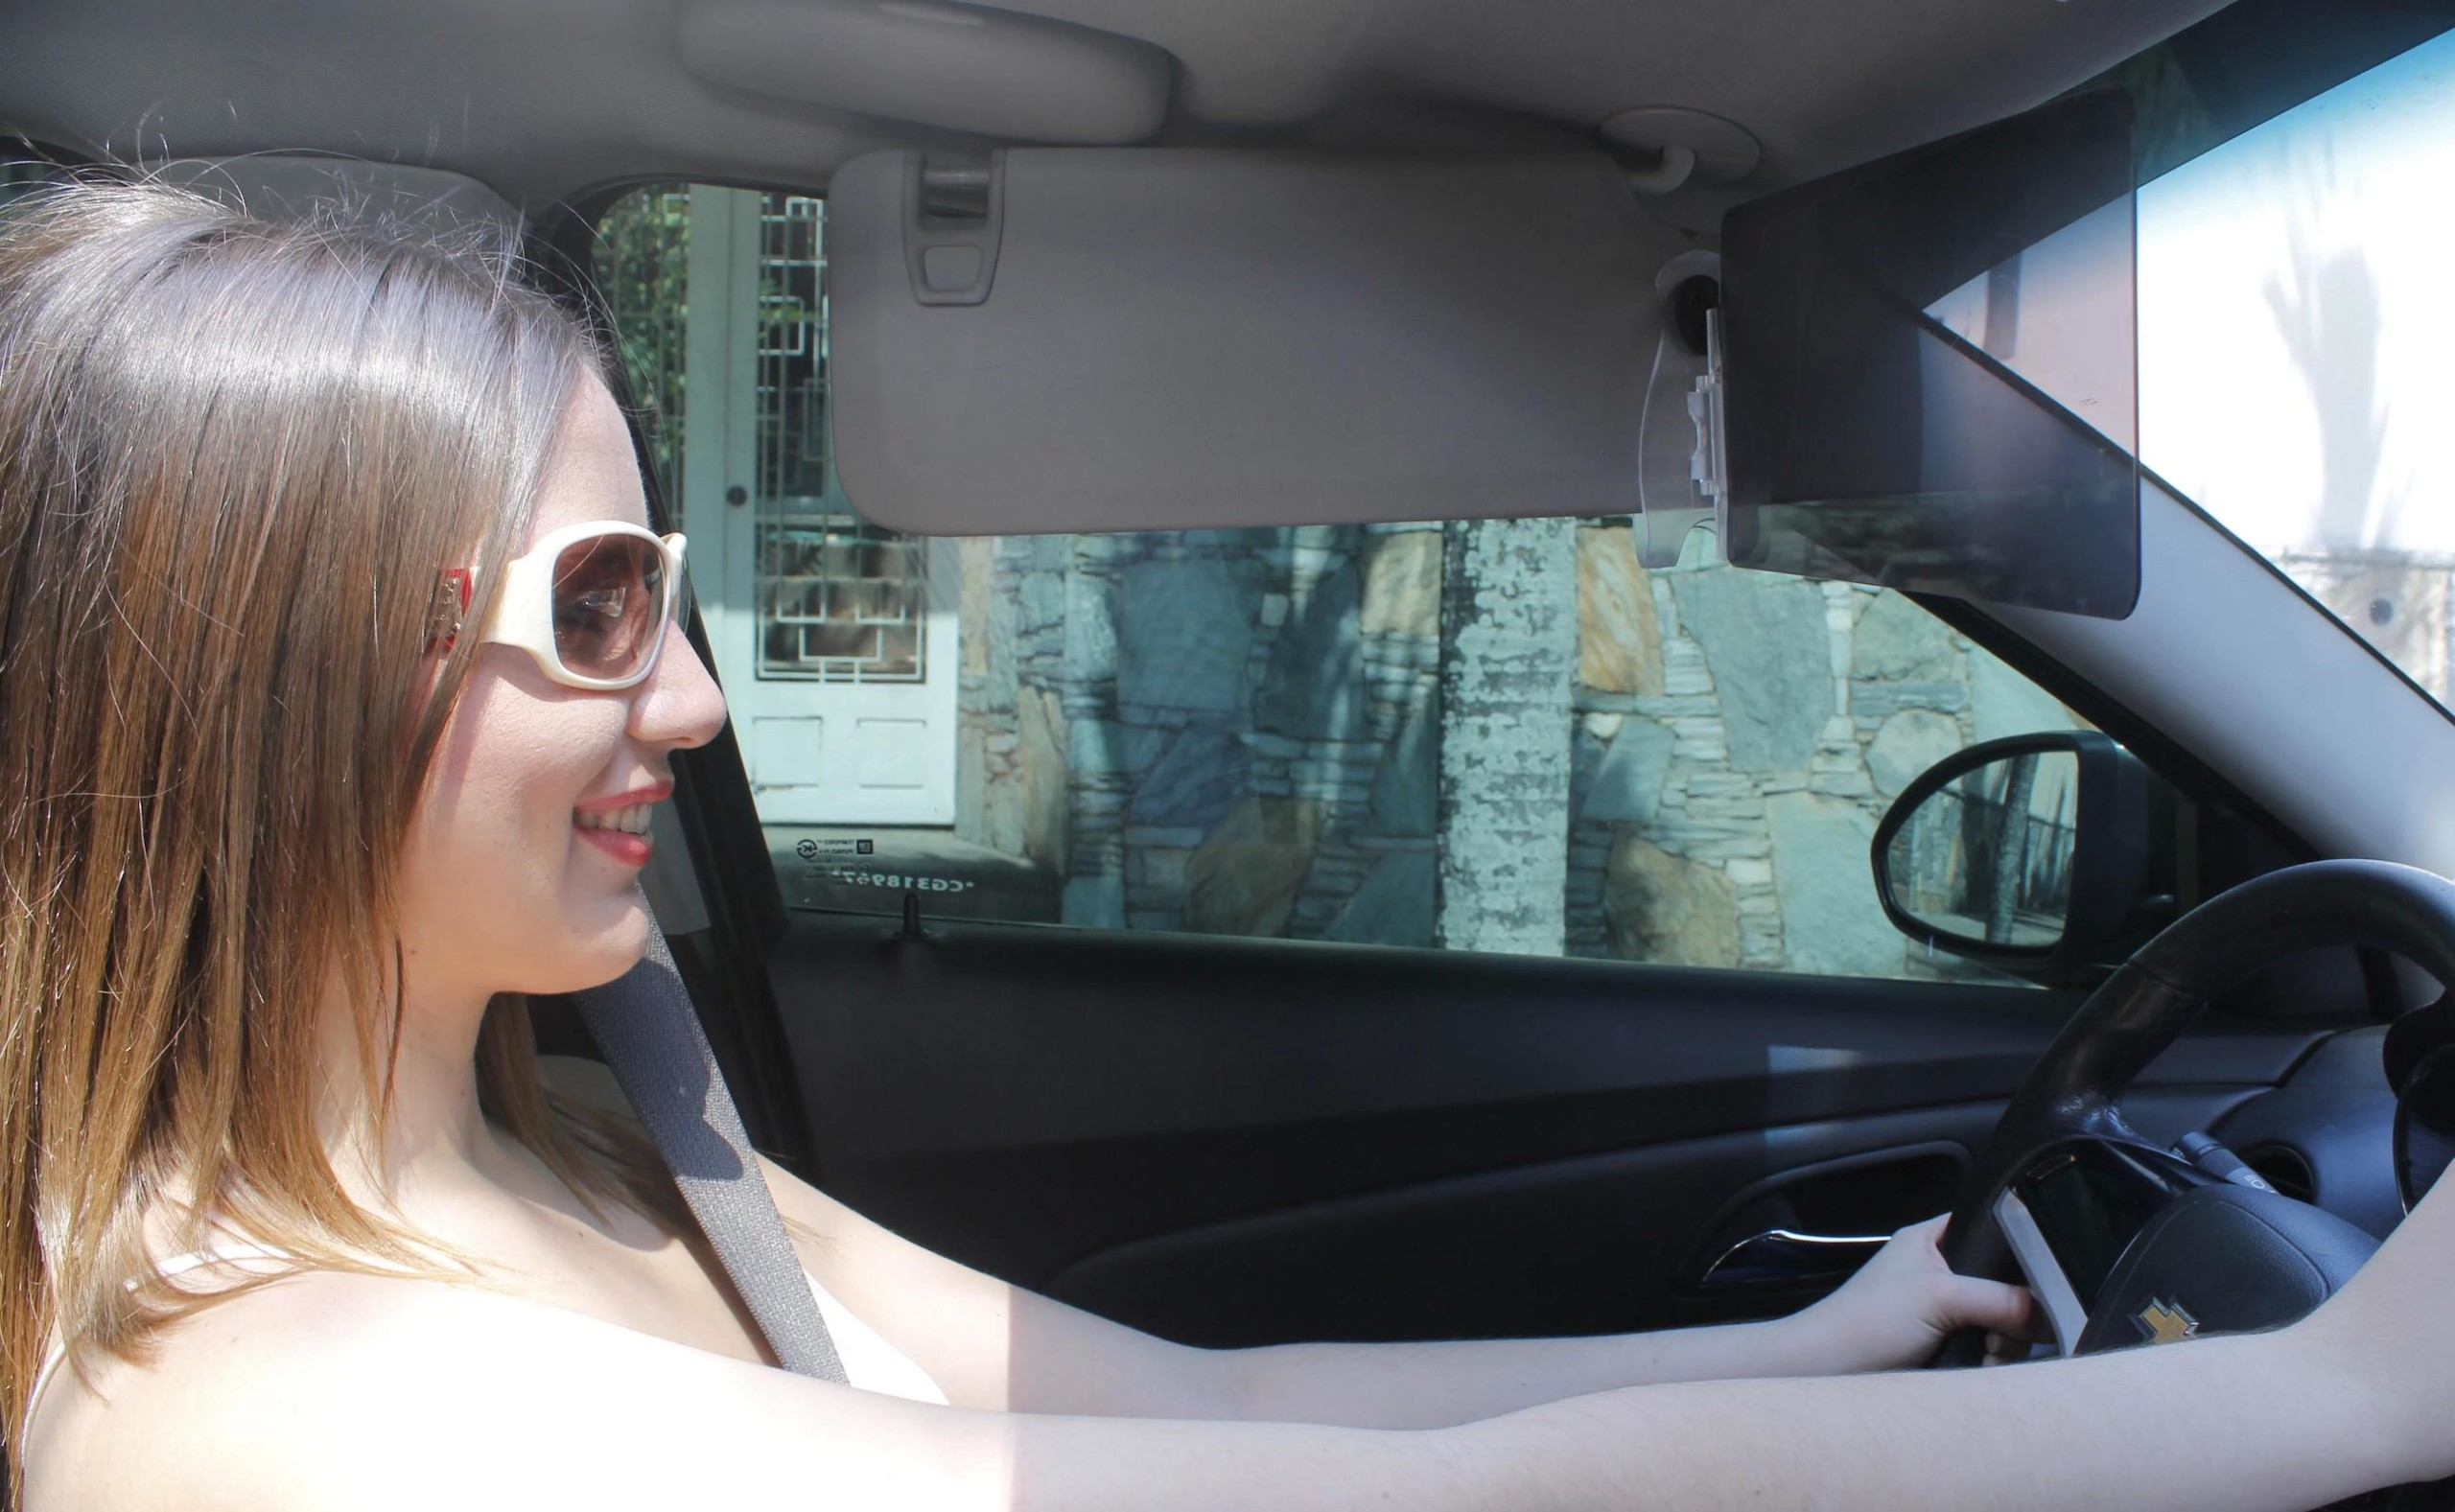 VisorTwin Glare-Blocking Car Visor blocks the sun without blocking your view